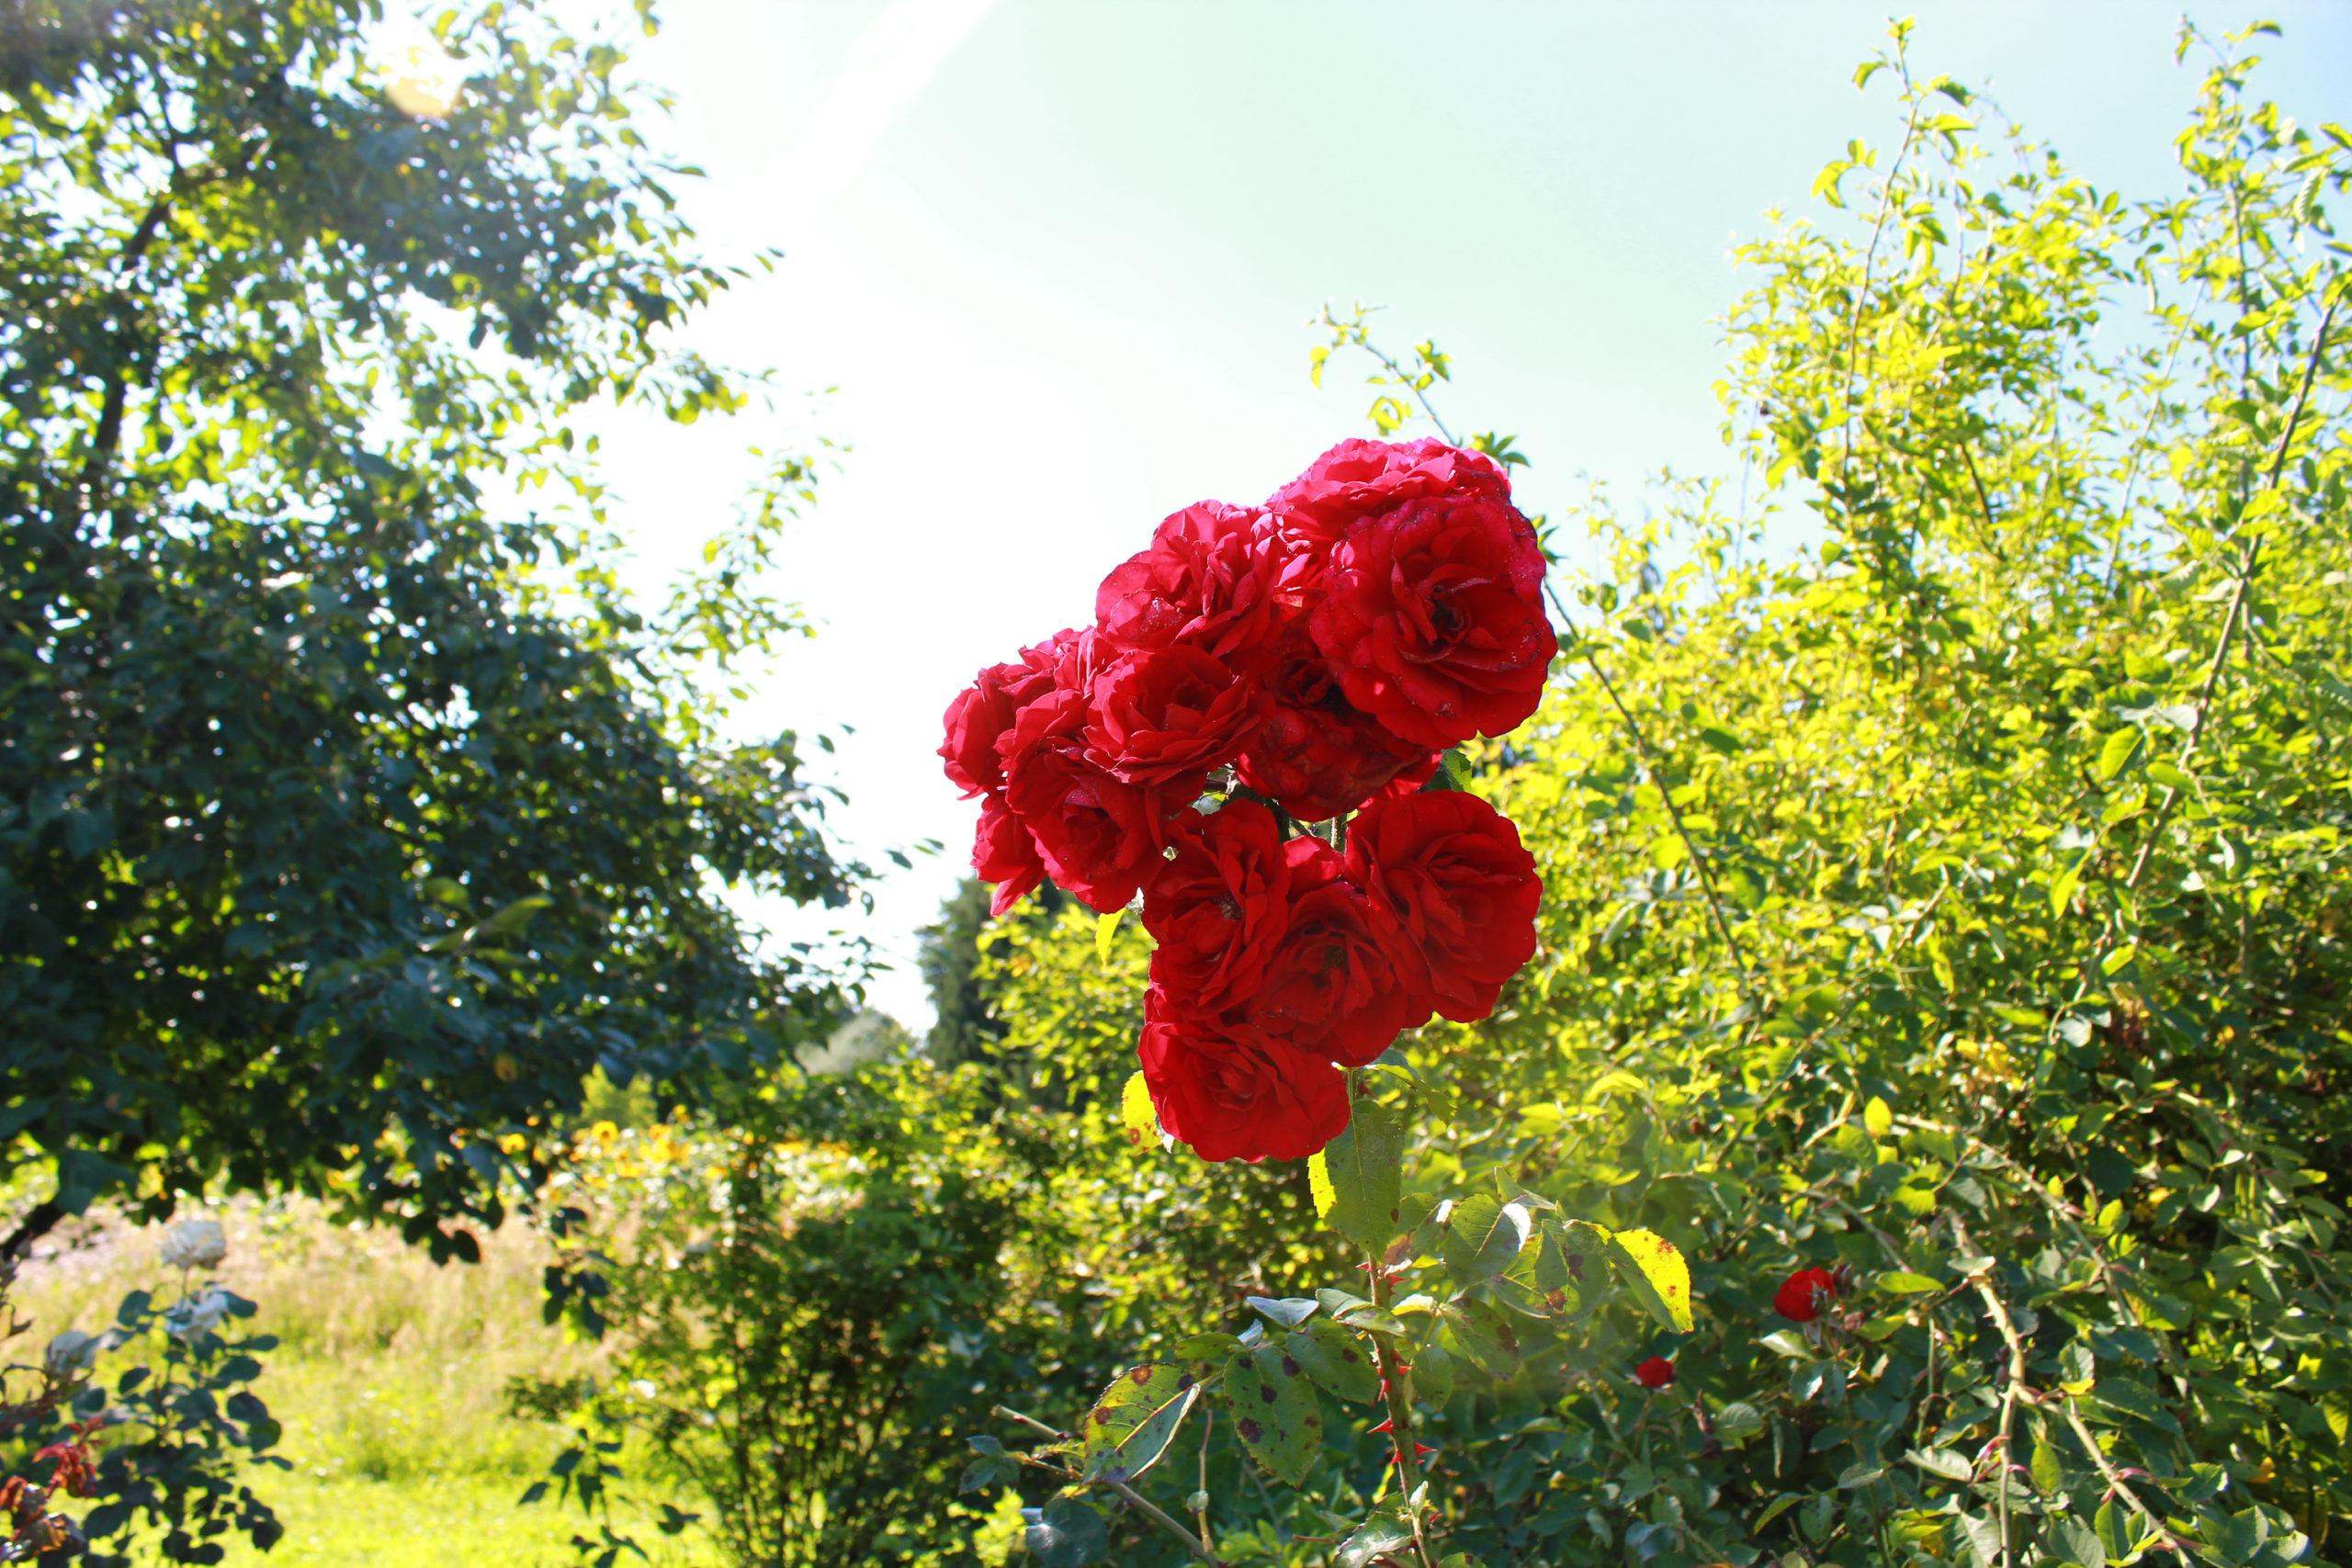 róże na krzaku